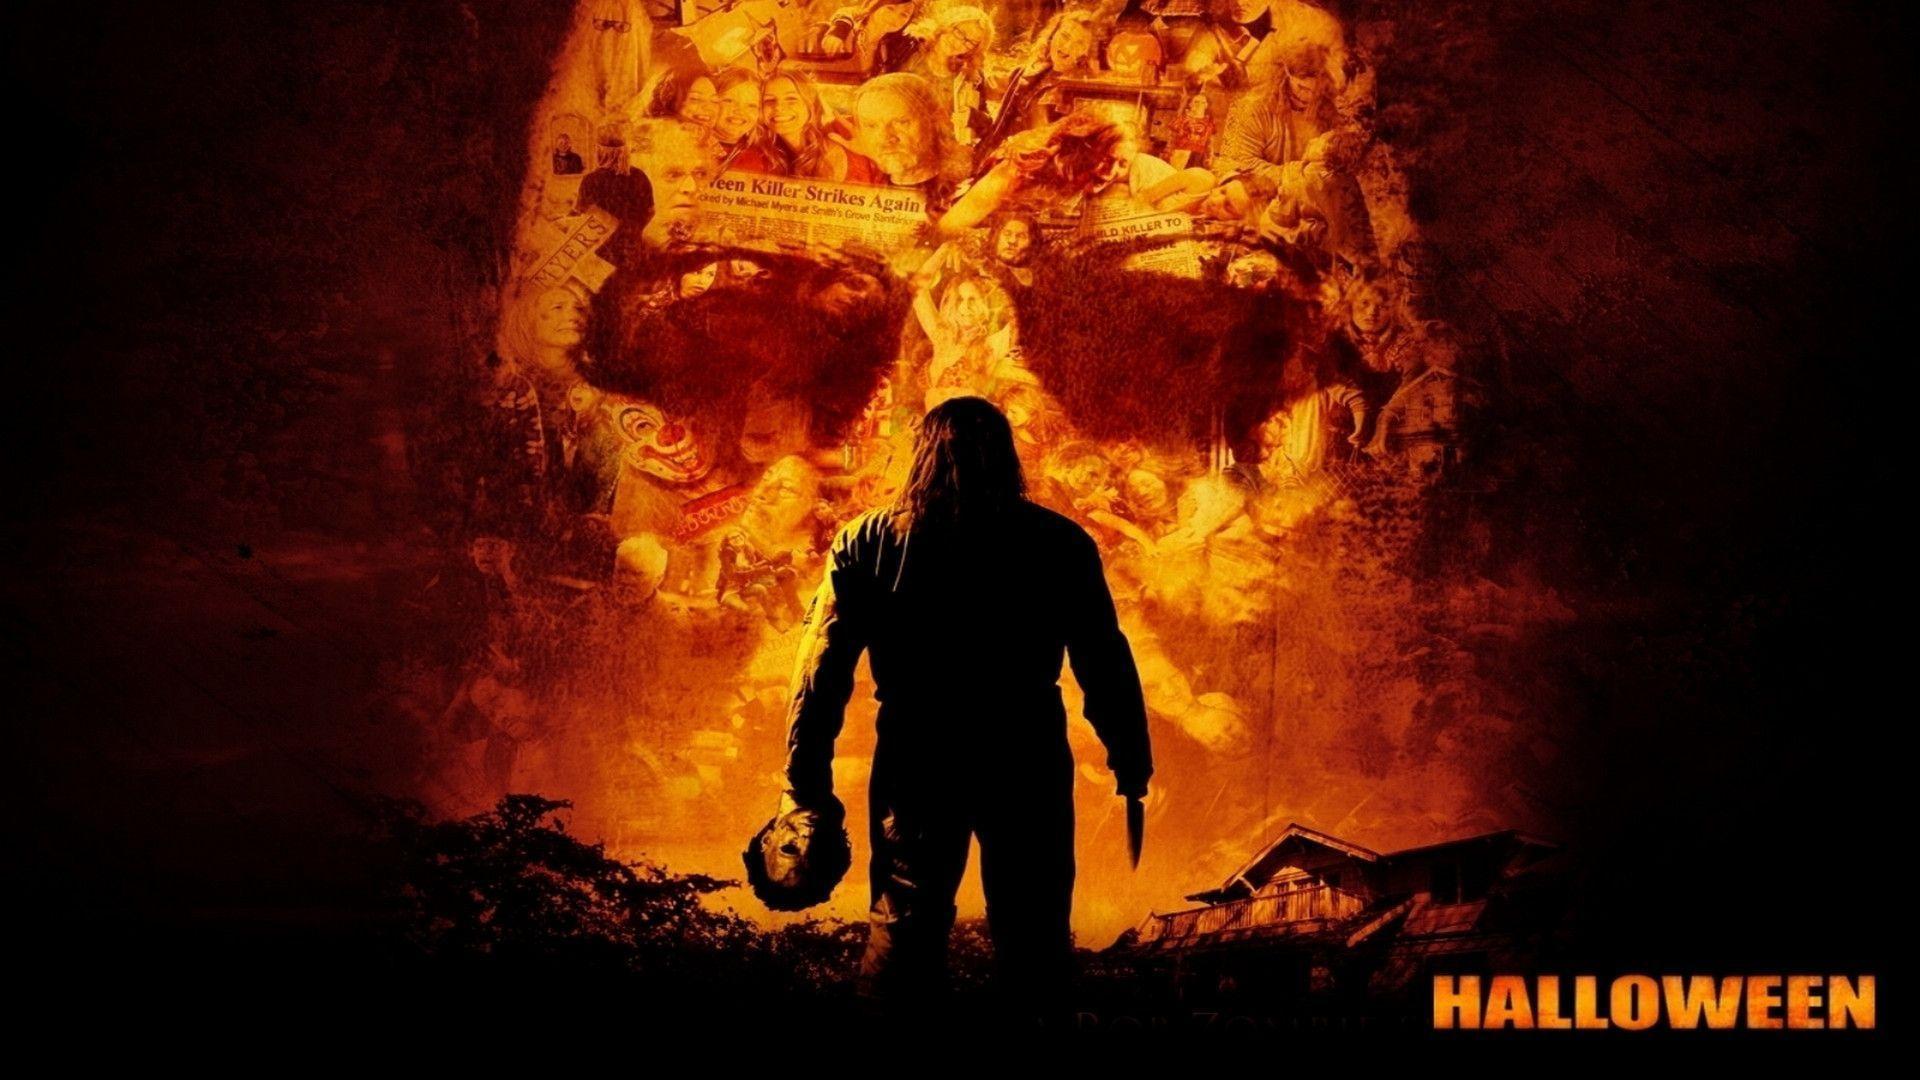 halloween 2 movie wallpaper - photo #5